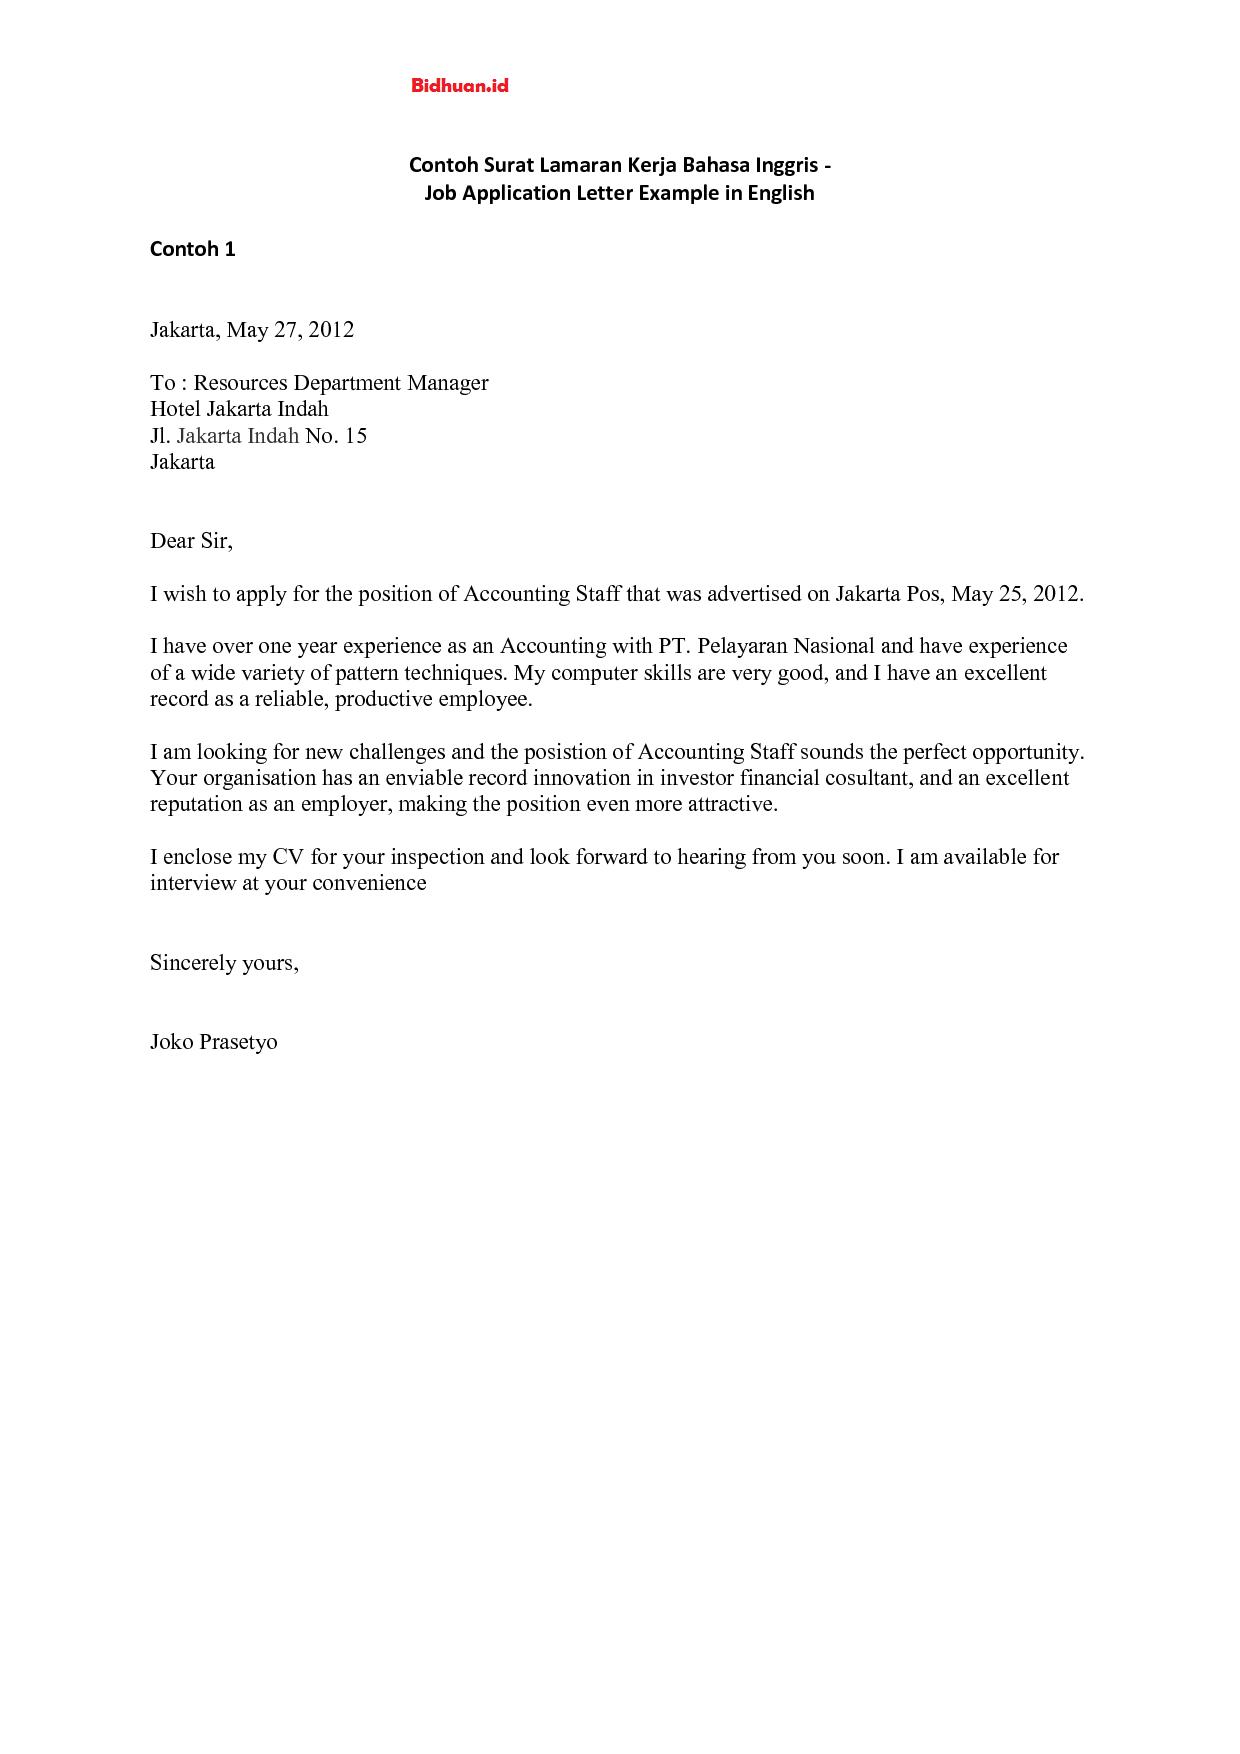 contoh job application letter bahasa Inggris